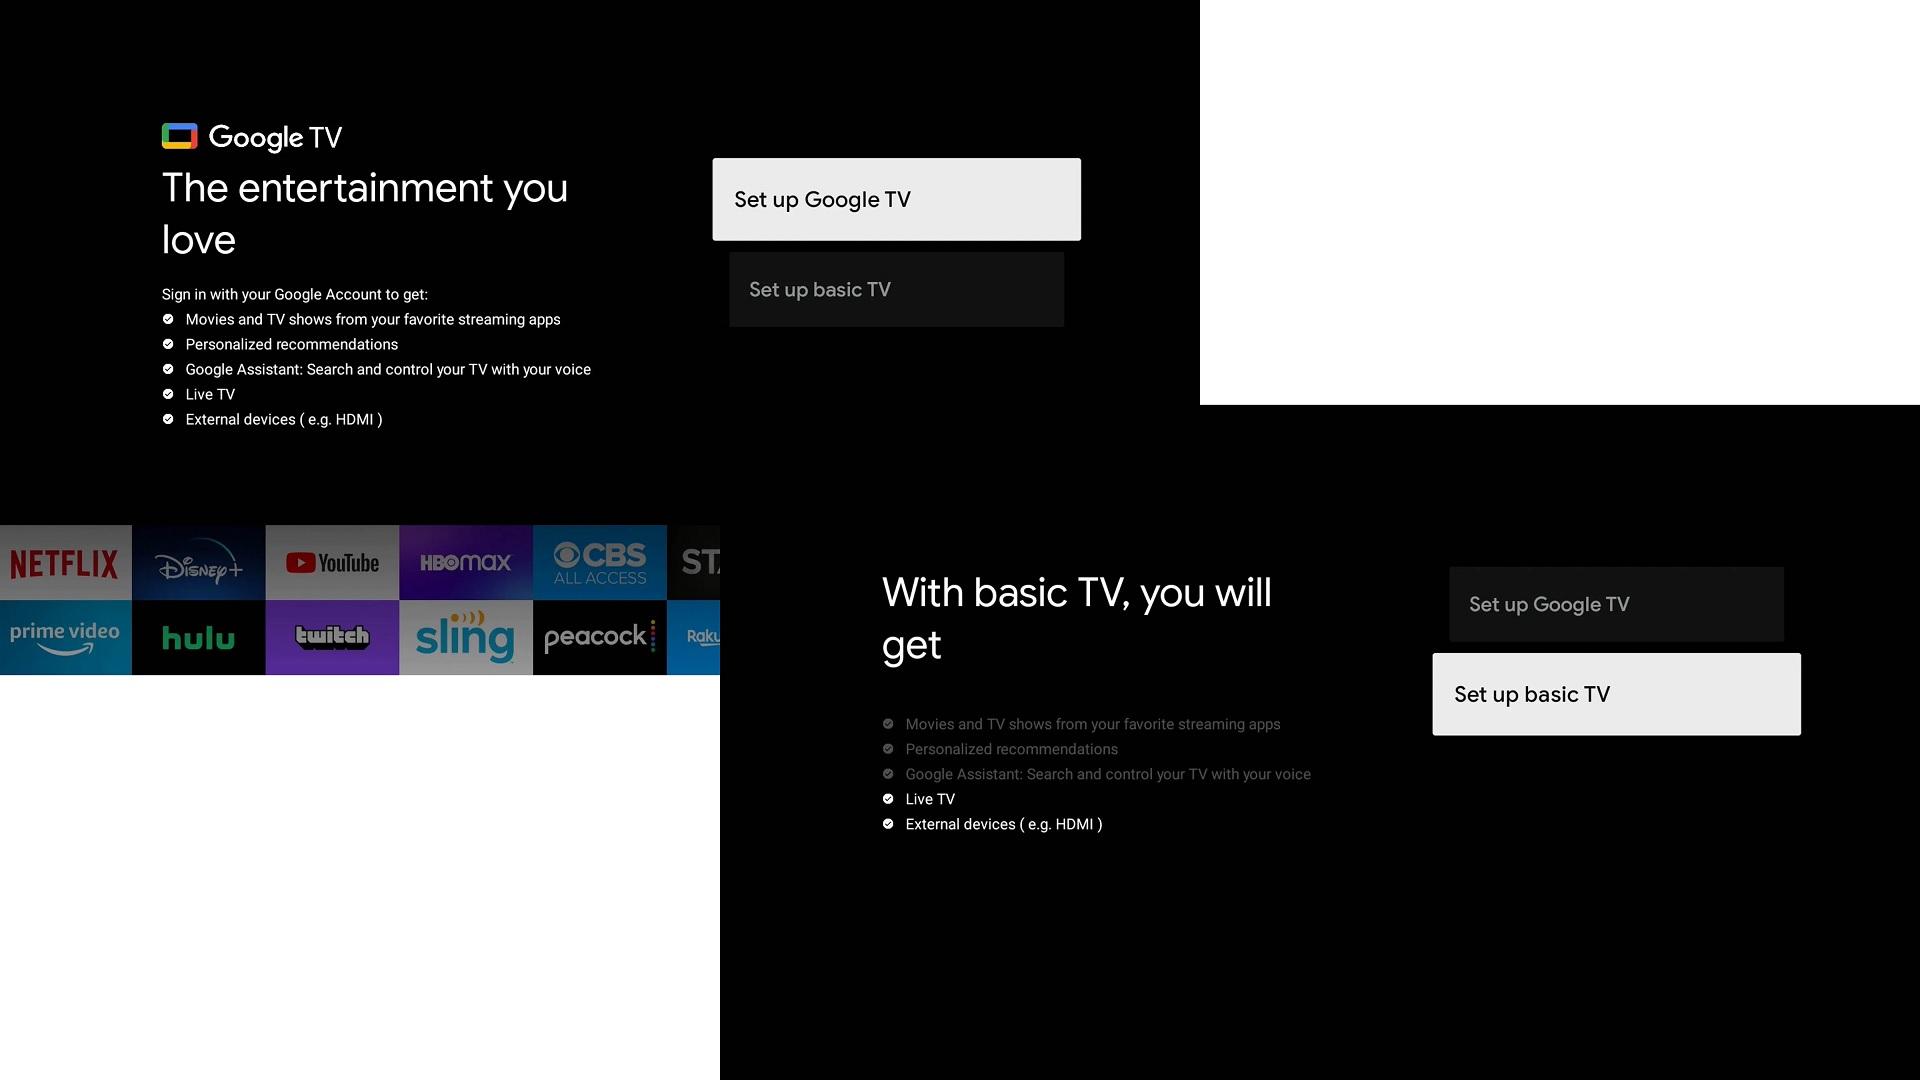 Google TV basic TV